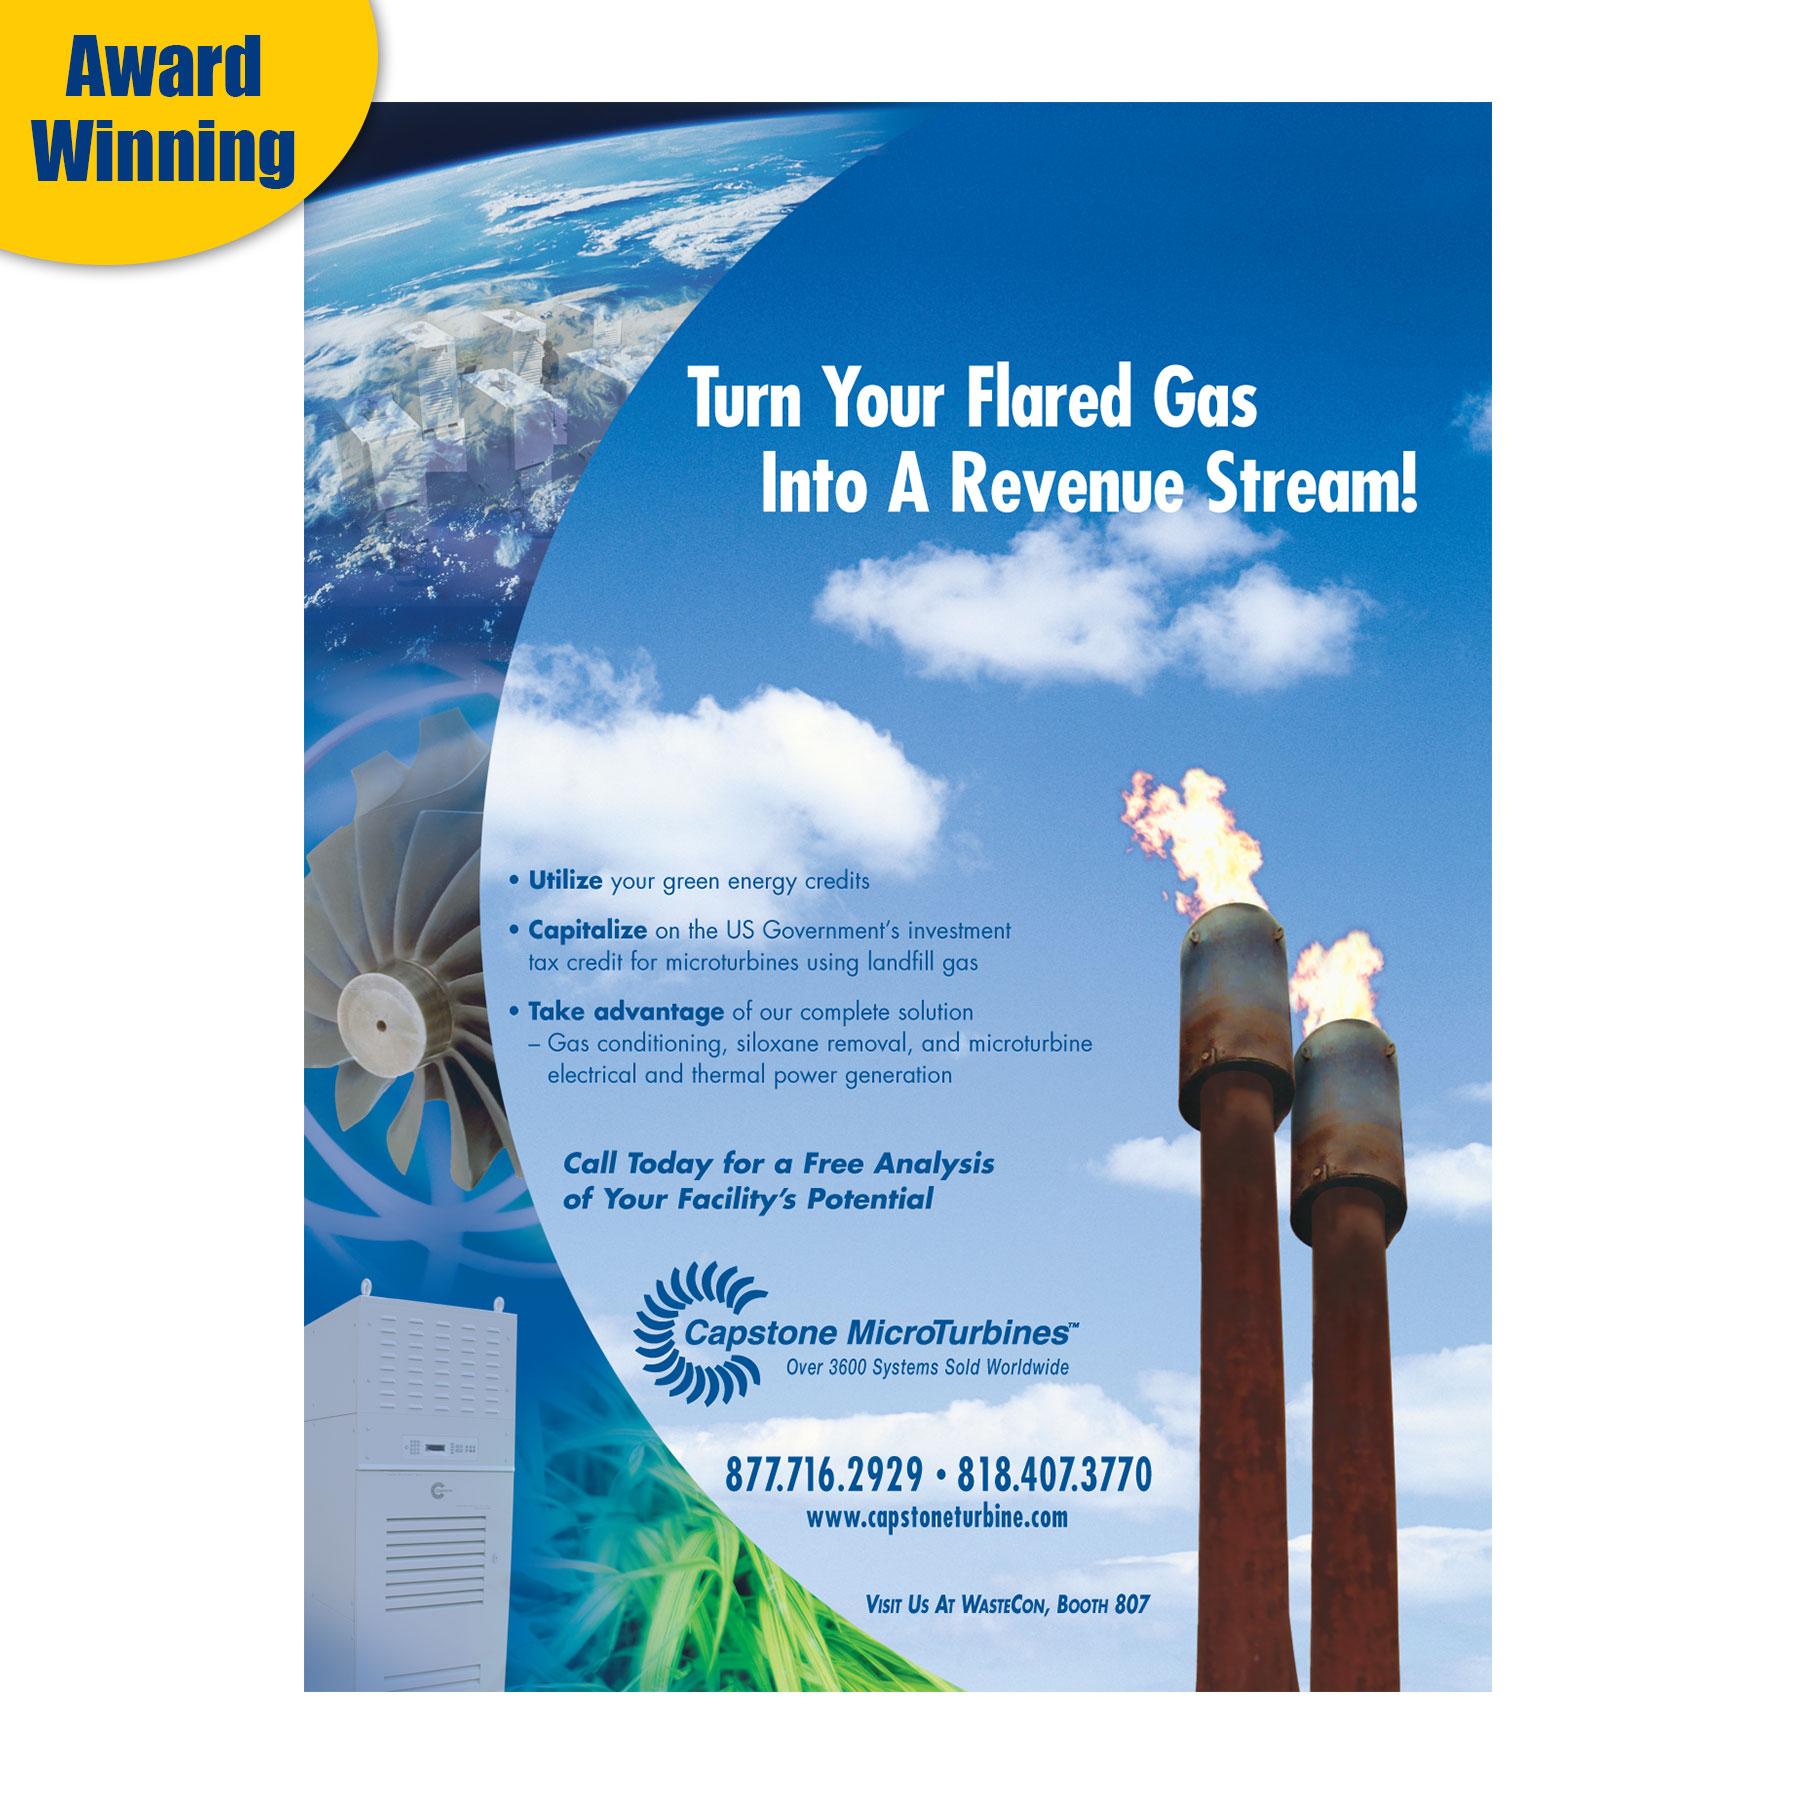 Capstone Turbine MSW Management Magazine Ad